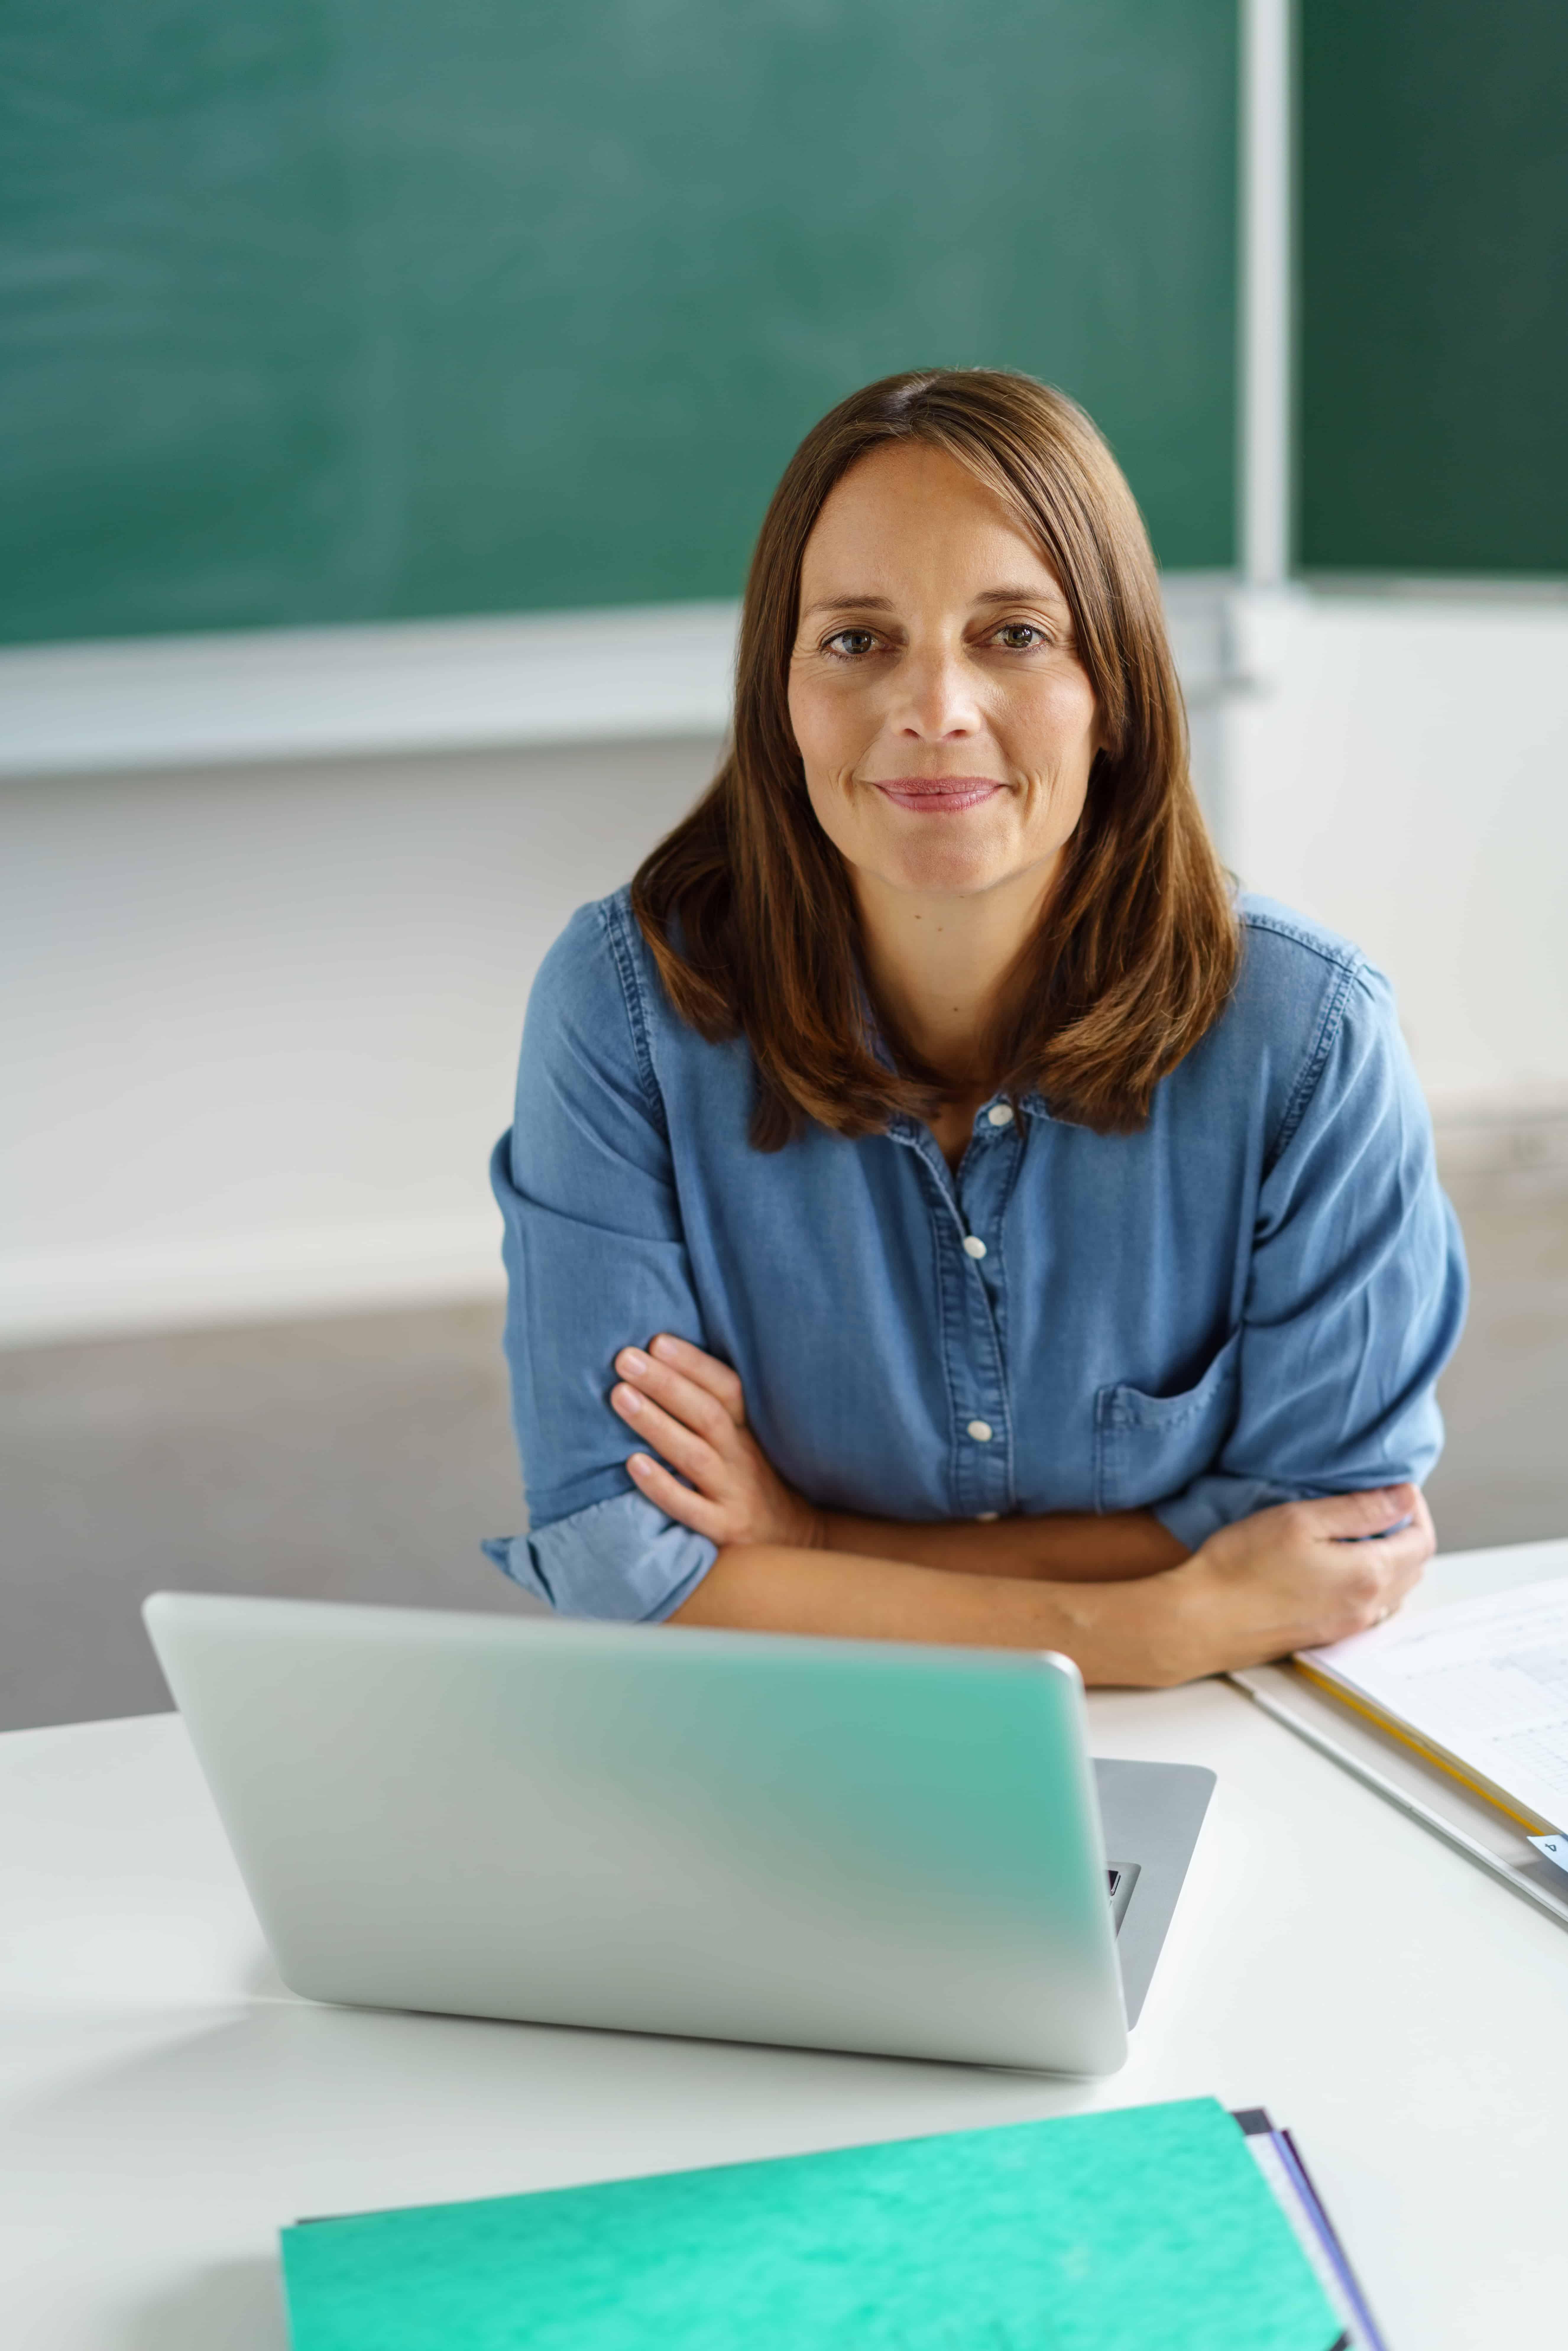 Labster - Community college teacher